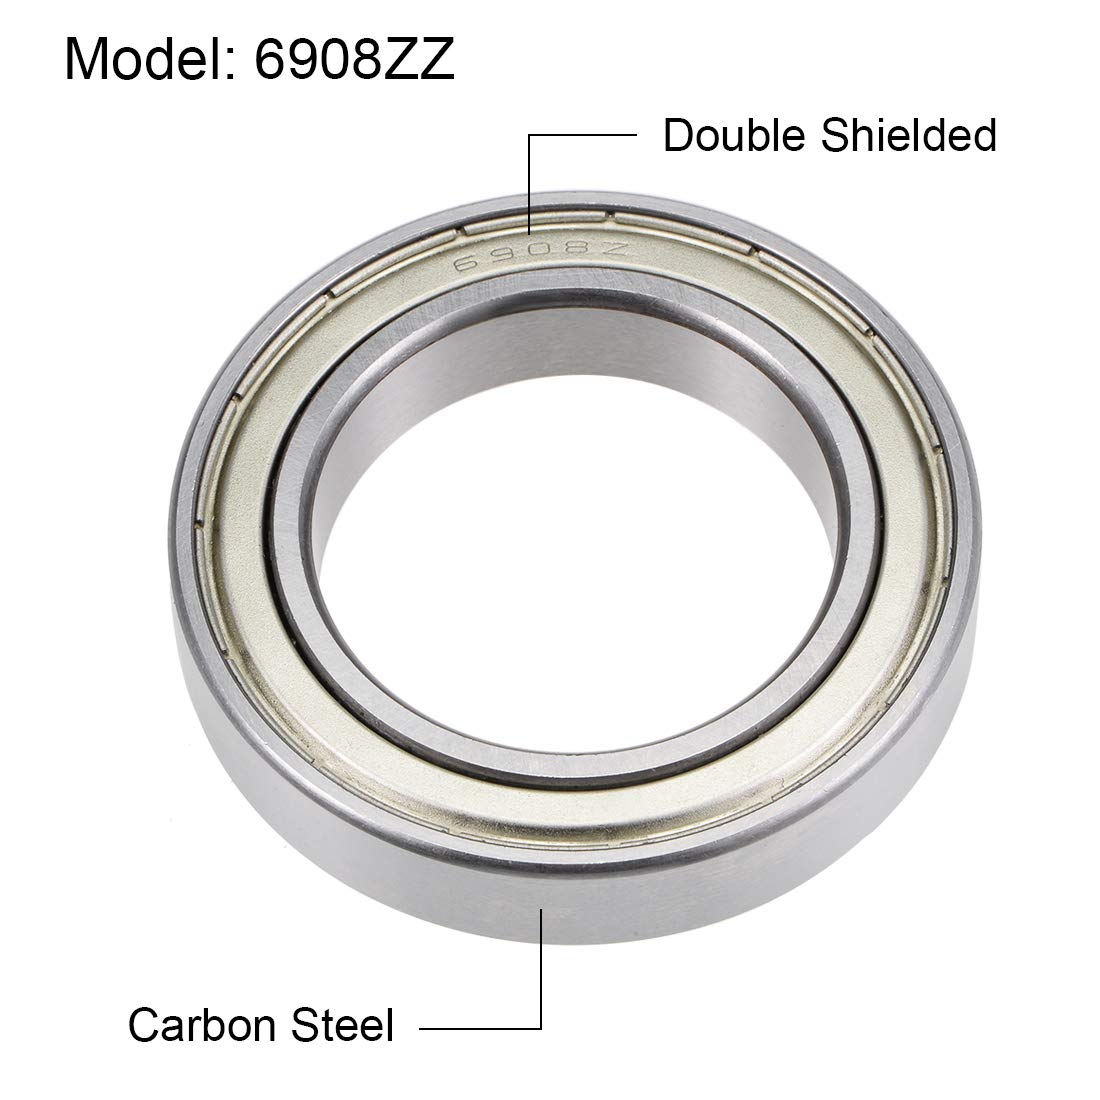 sourcing map 6908ZZ Deep Groove Ball Bearings Z2 40mm X 62mm X 12mm Double Shielded Carbon Steel 2pcs